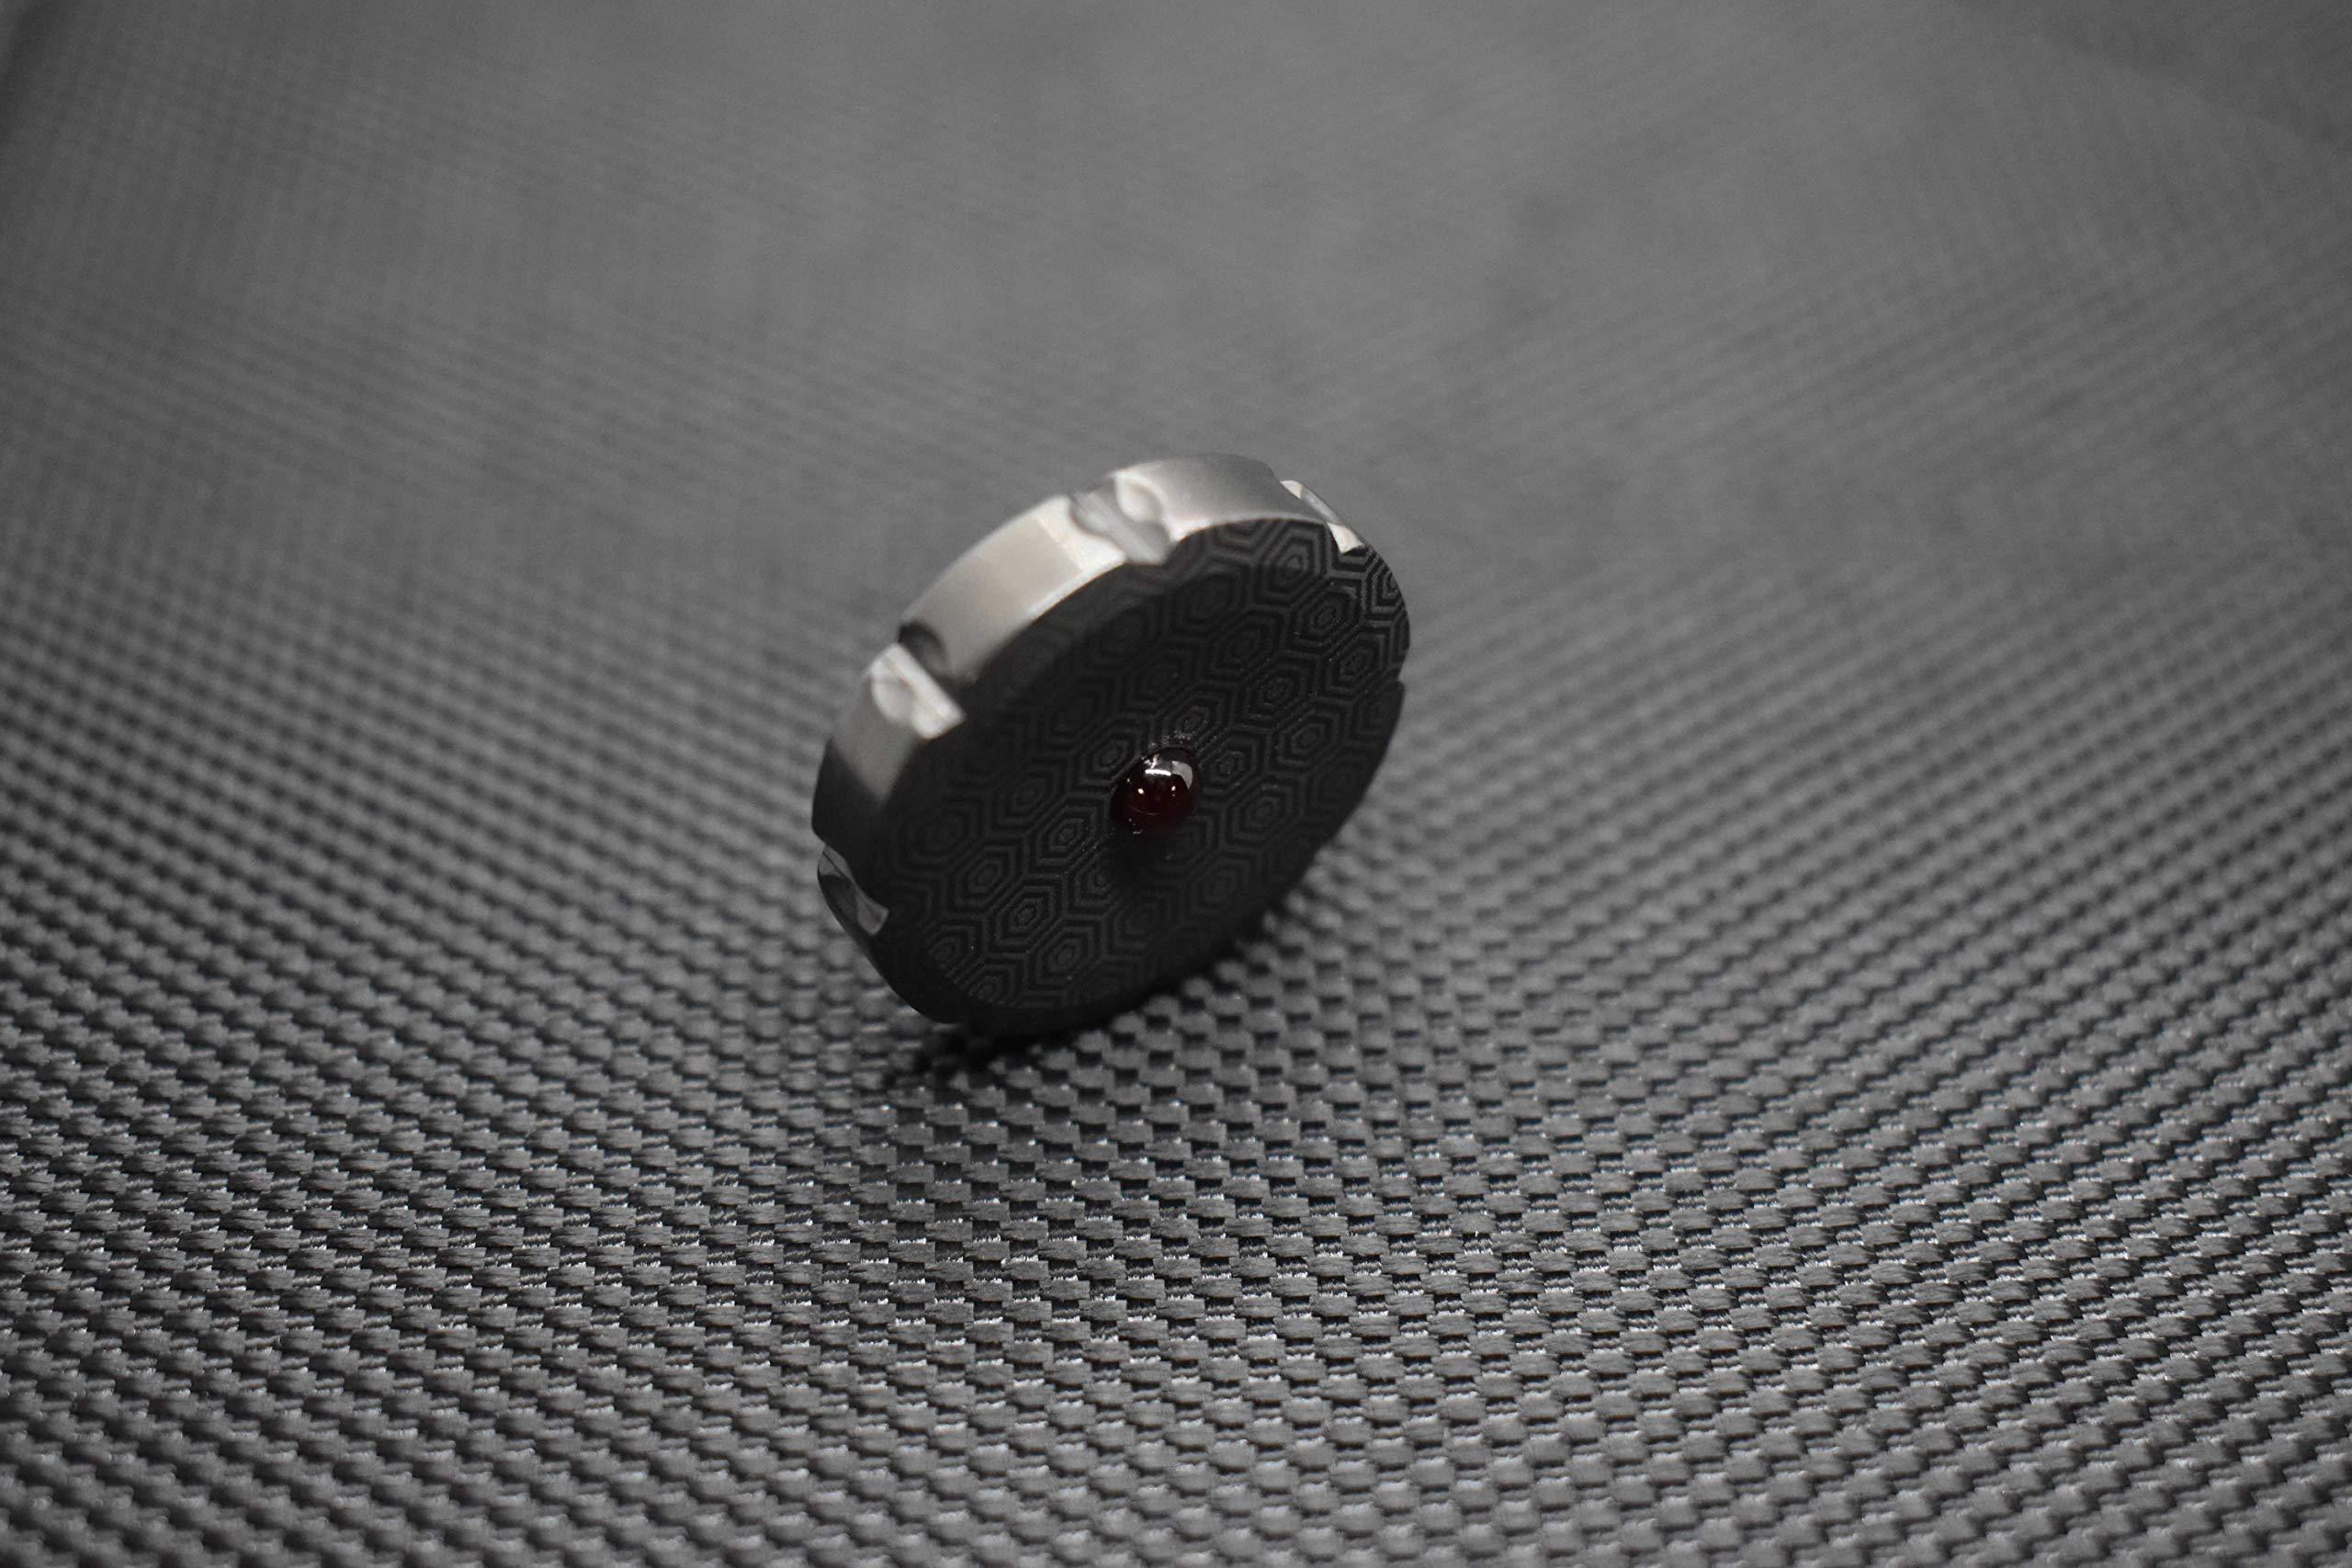 MetonBoss Worry Coin Black Zirconium & Ruby Bearing   Everyday Carry Gear   Precision-Made and Desktop Display by MetonBoss (Image #5)